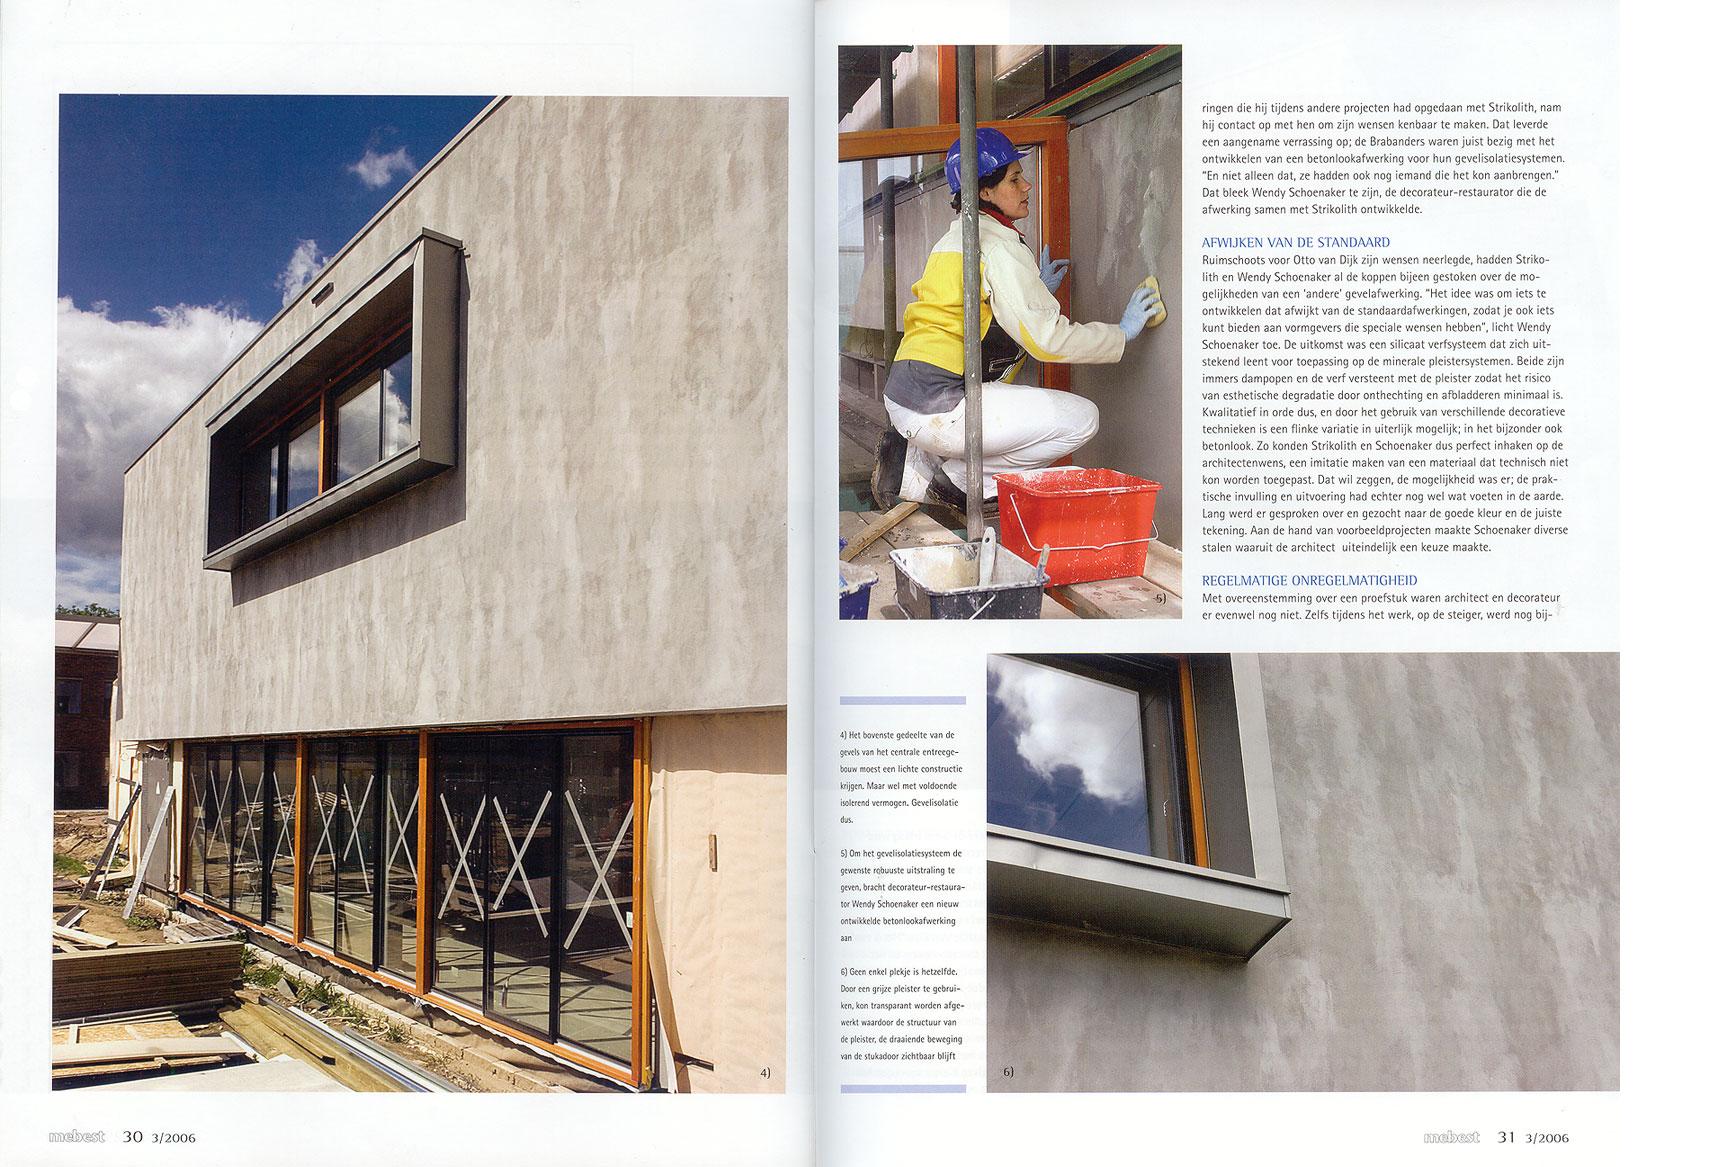 Ruwe bolster, blanke pit, betonlook blz 6 en 7